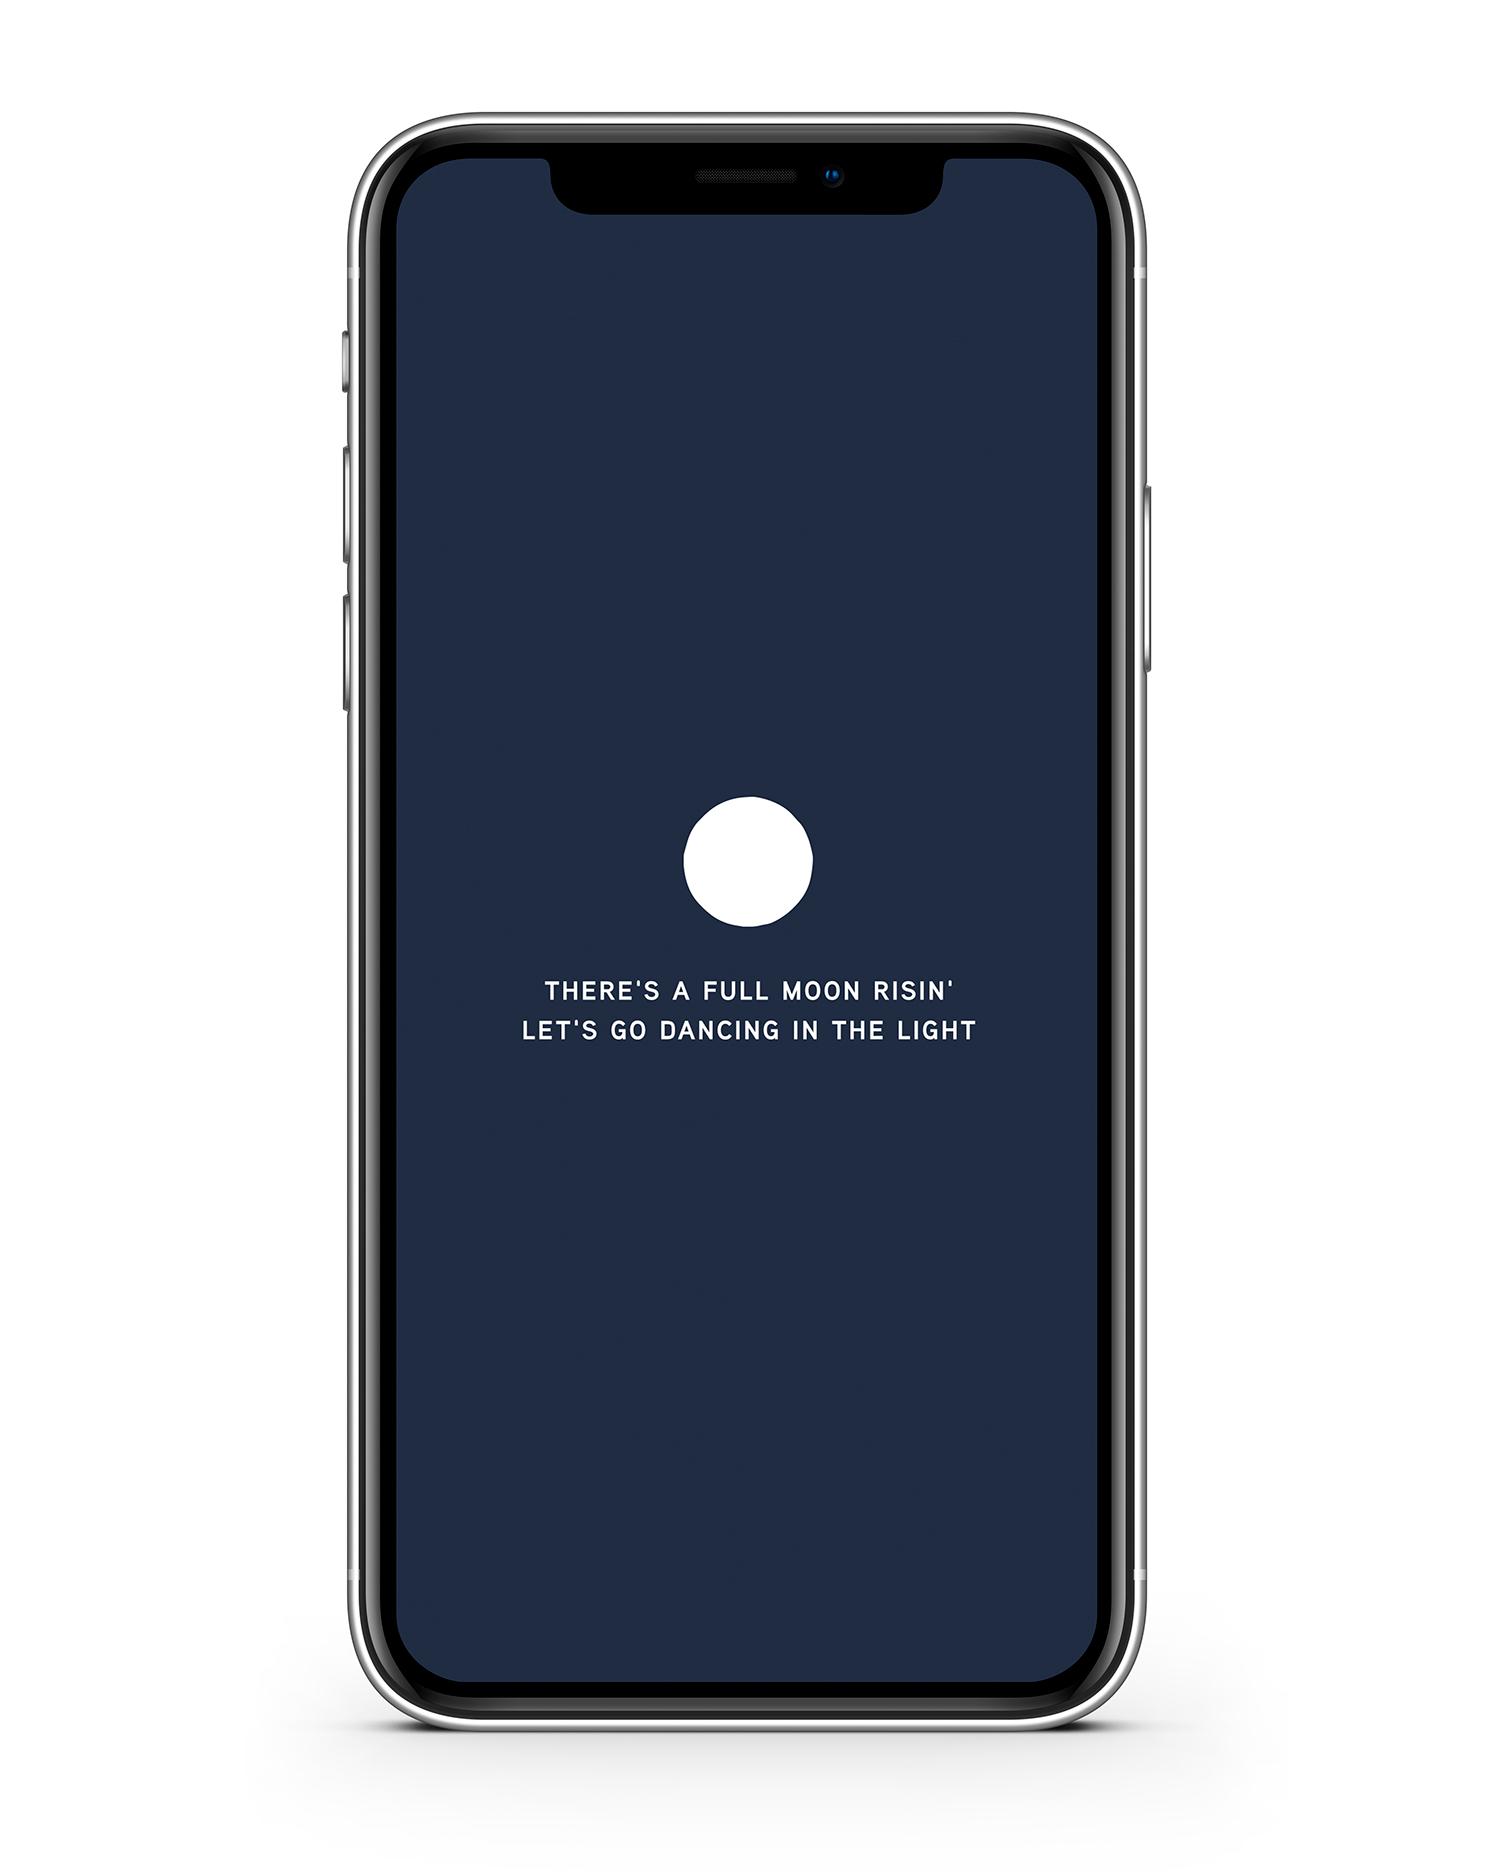 Haley Grand iPhone Wallpaper Full Moon Rising